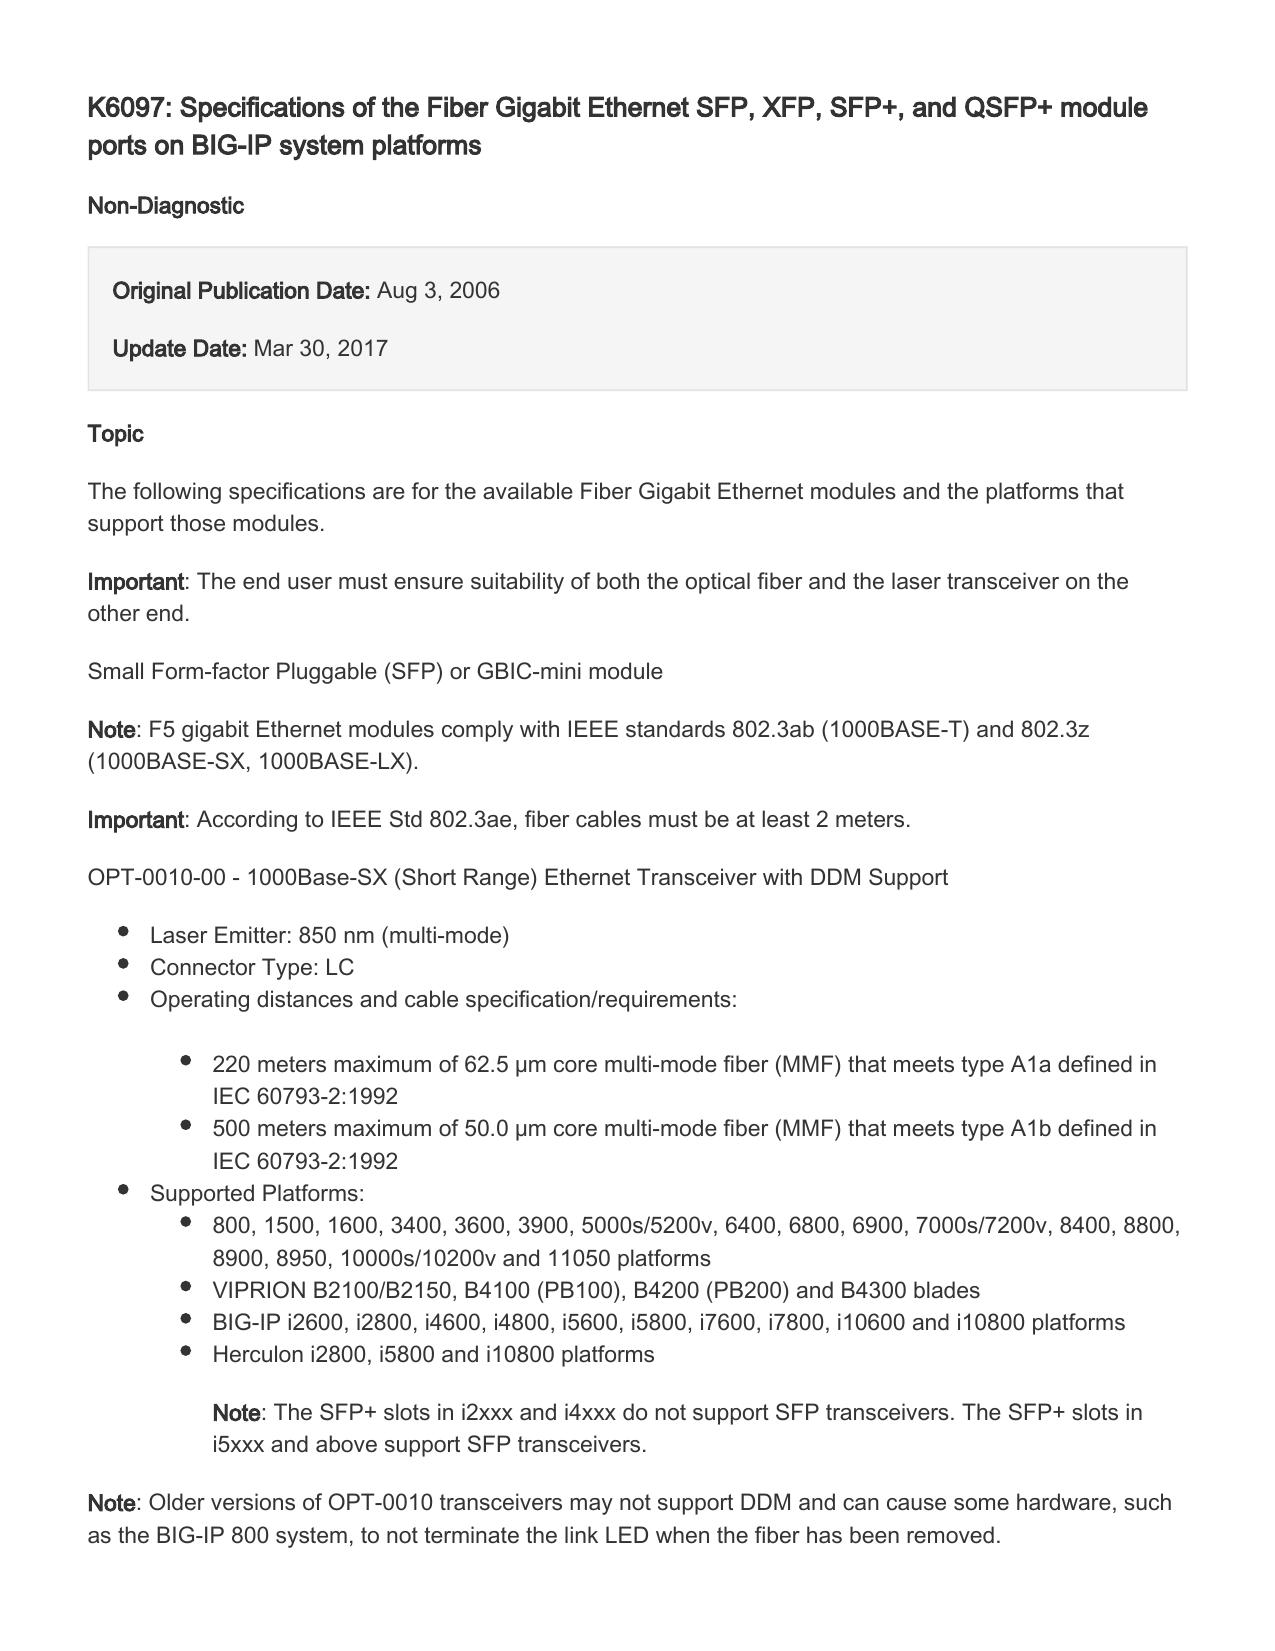 K6097: Specifications of the Fiber Gigabit Ethernet SFP, XFP, SFP+